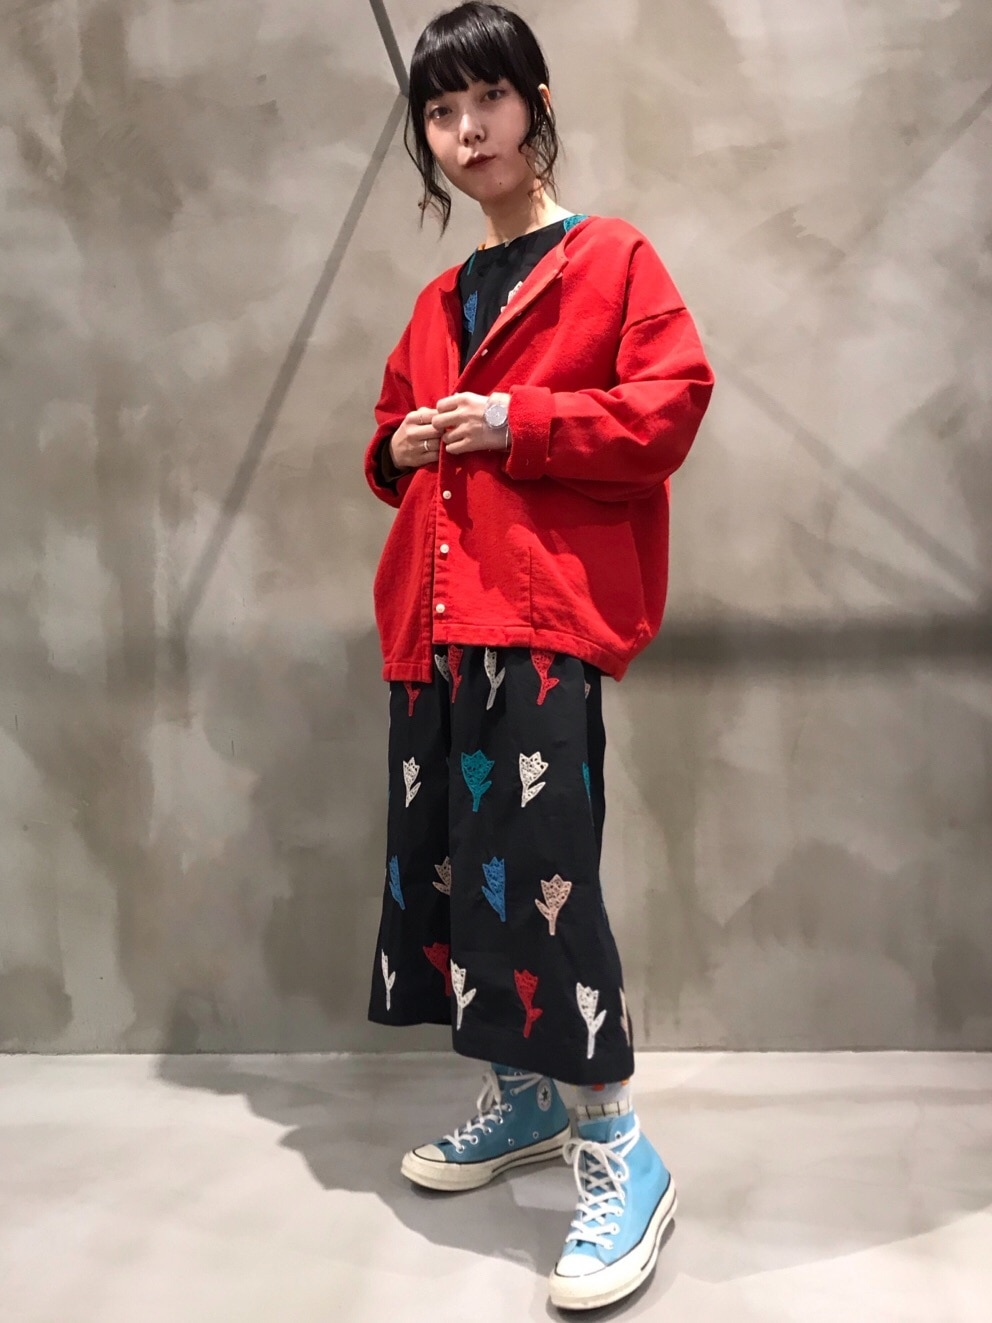 bulle de savon 渋谷スクランブルスクエア 身長:153cm 2020.03.16